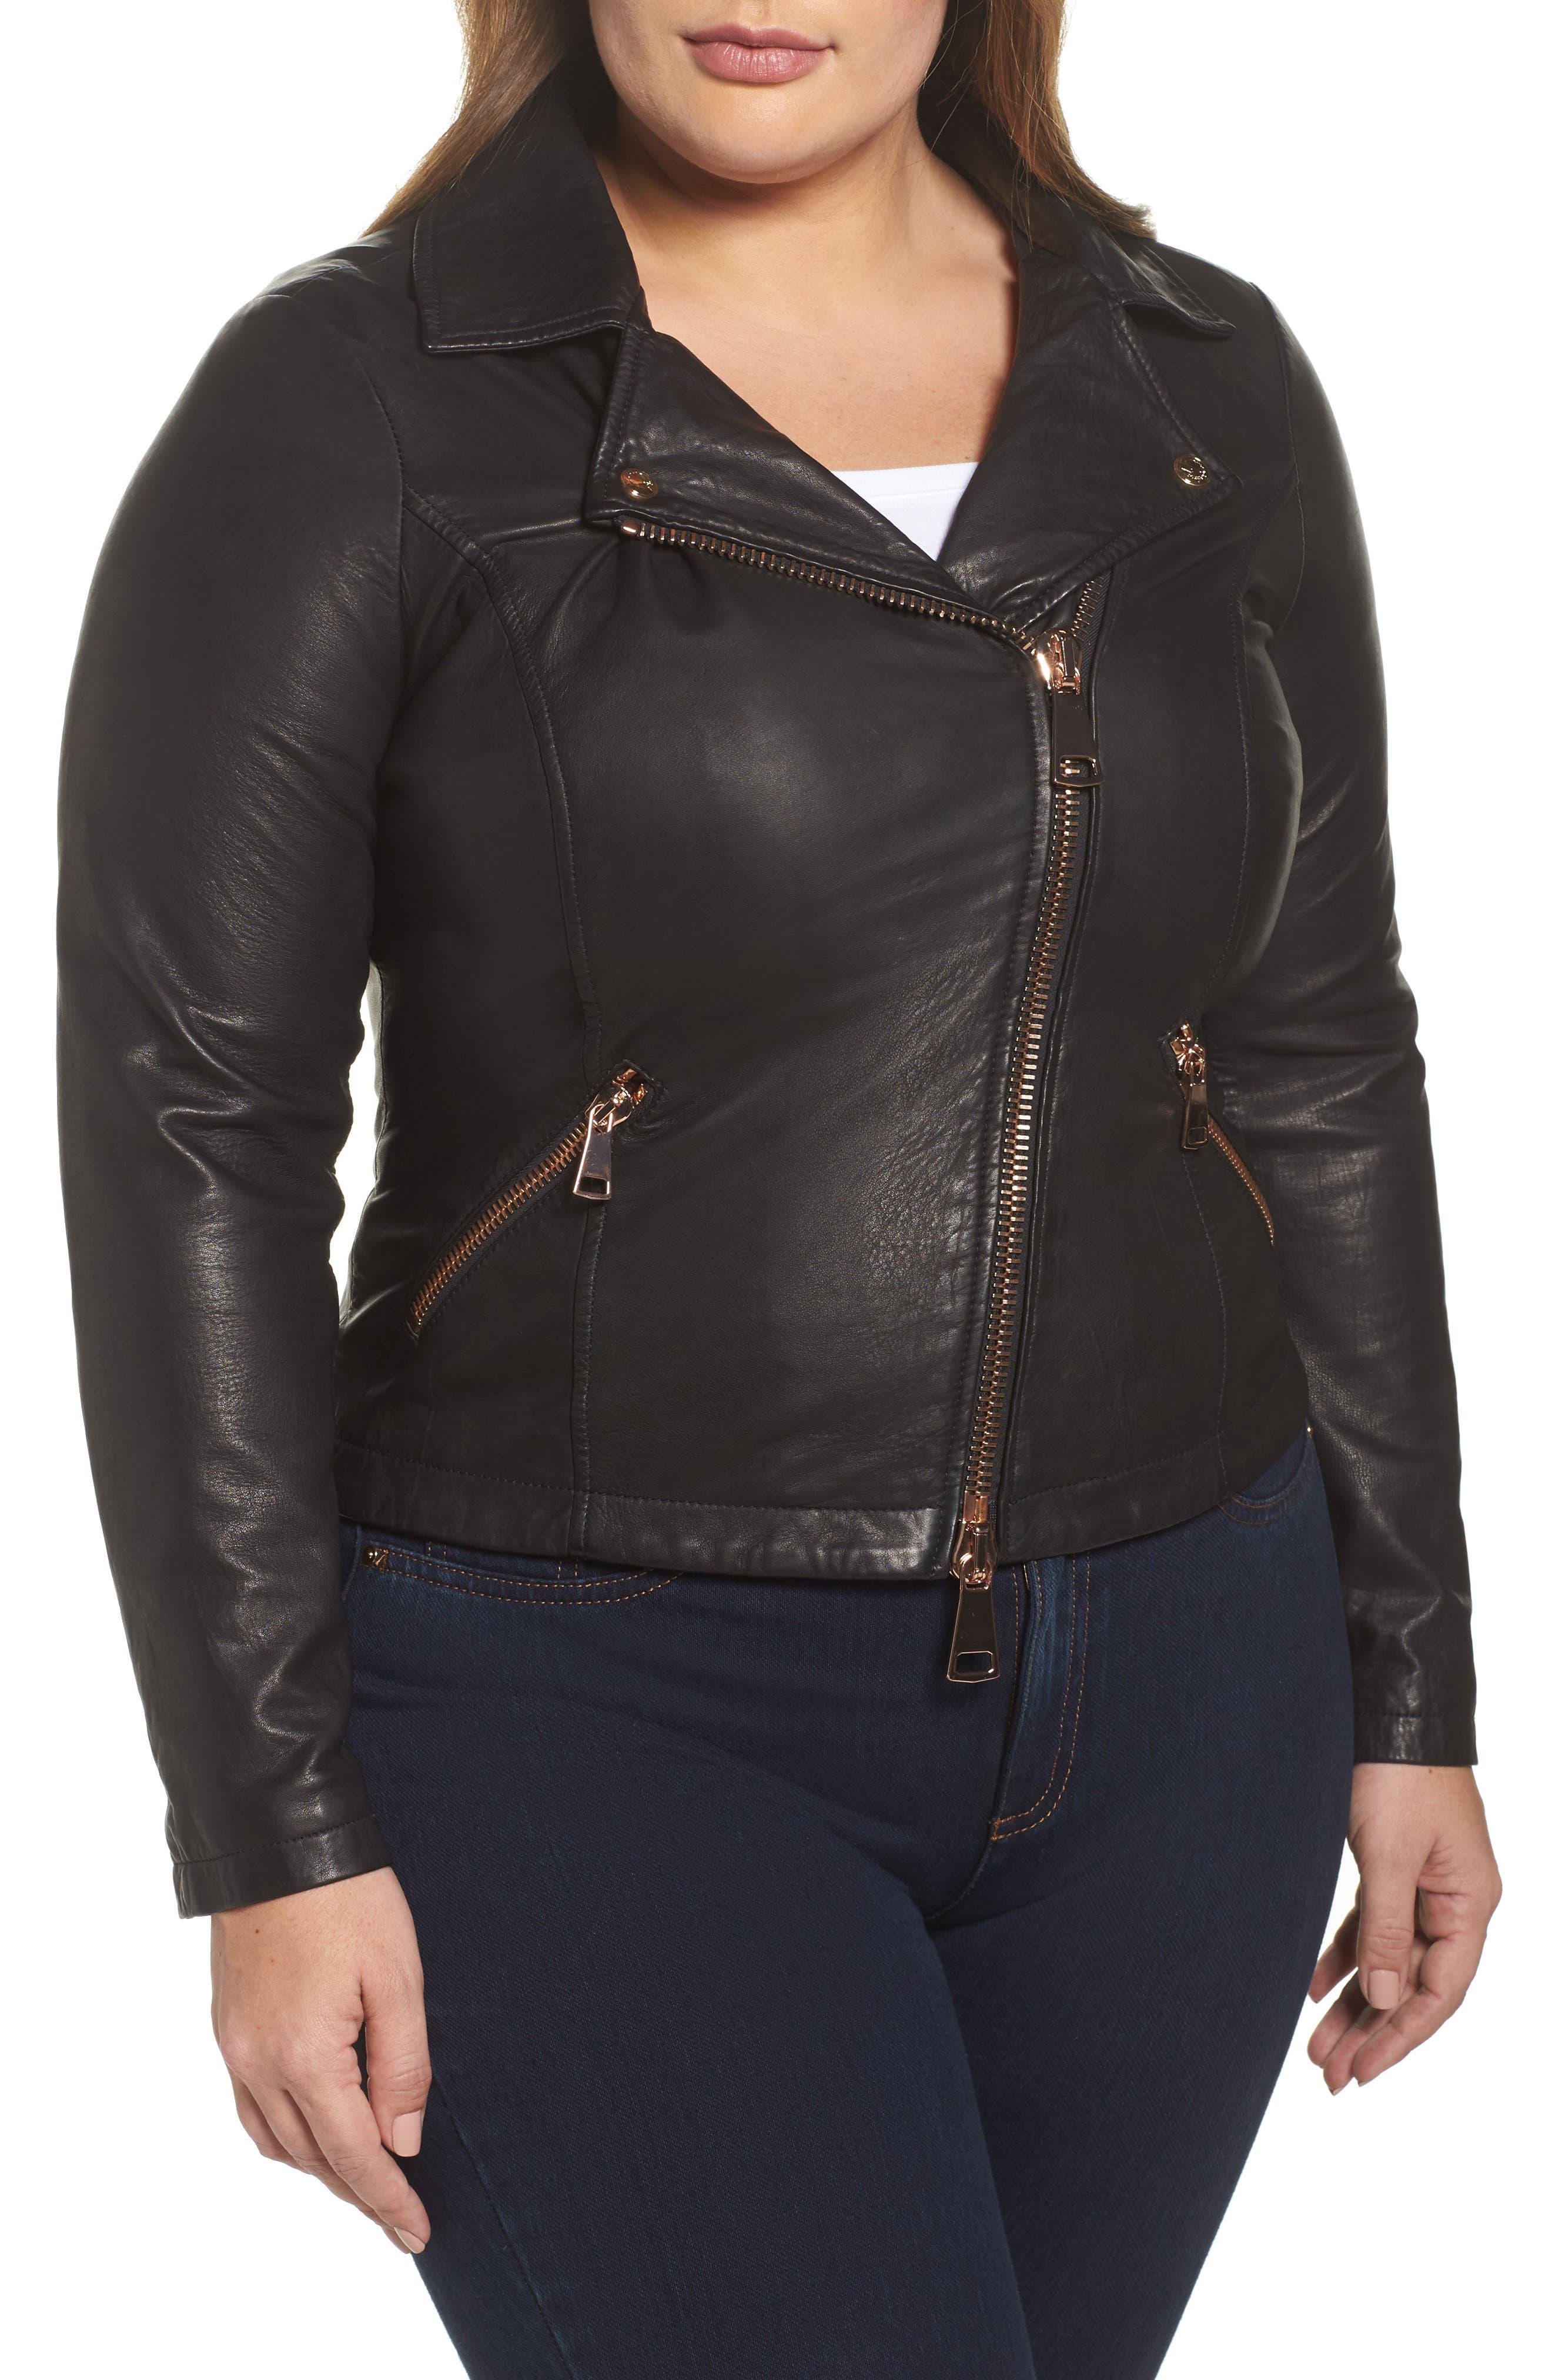 Ebanista Leather Biker Jacket,                             Alternate thumbnail 4, color,                             001